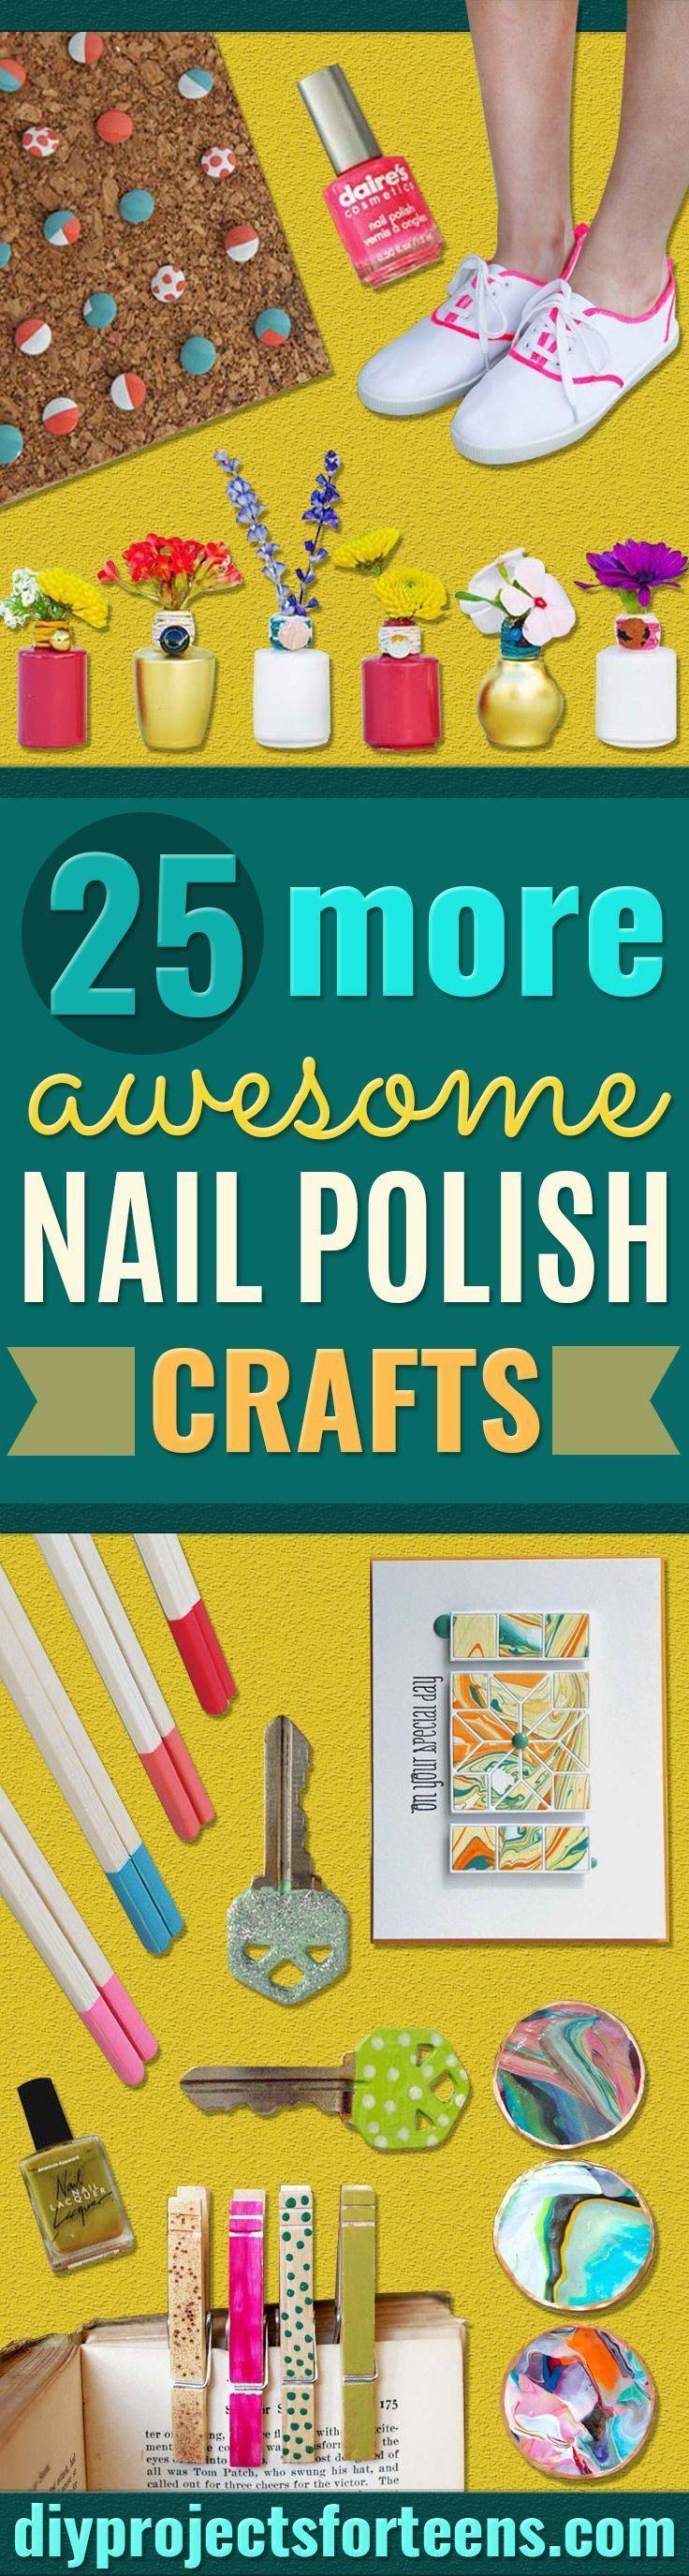 Pin by Tabitha V on Kids outdoor play | Pinterest | Nail polish ...